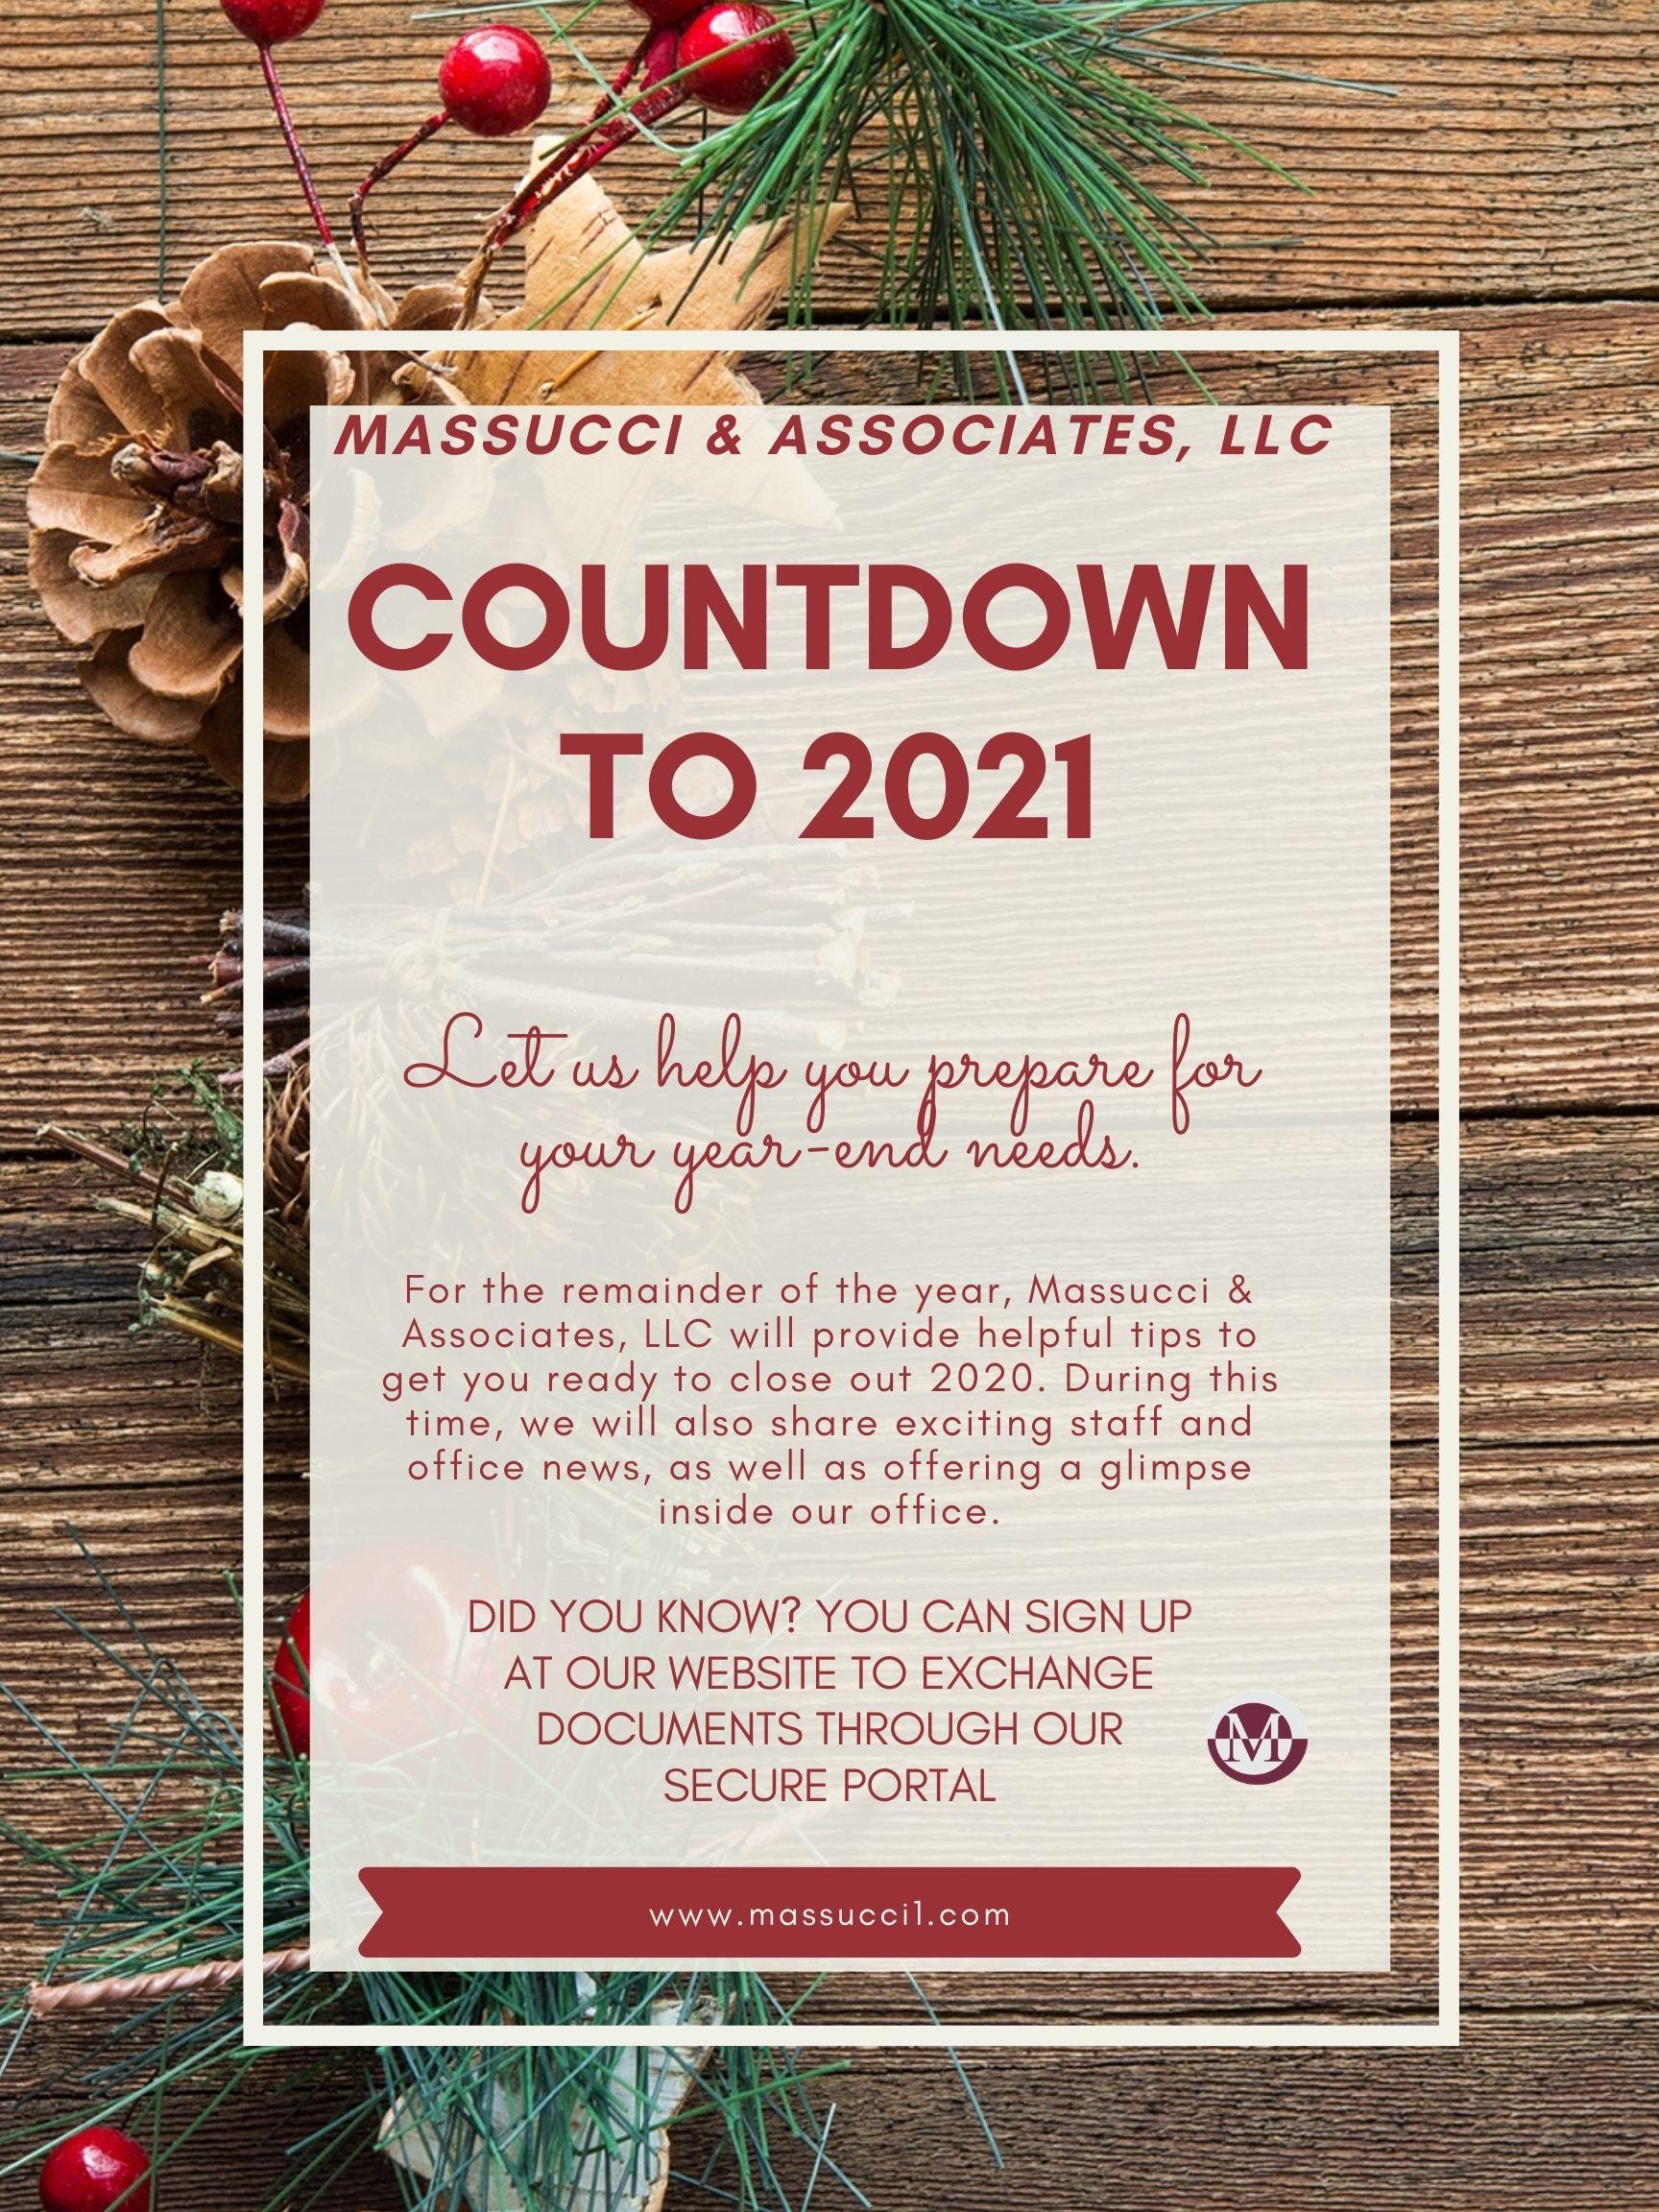 Countdown To Christmas 2021 News Countdown To 2021 Massucci Associates